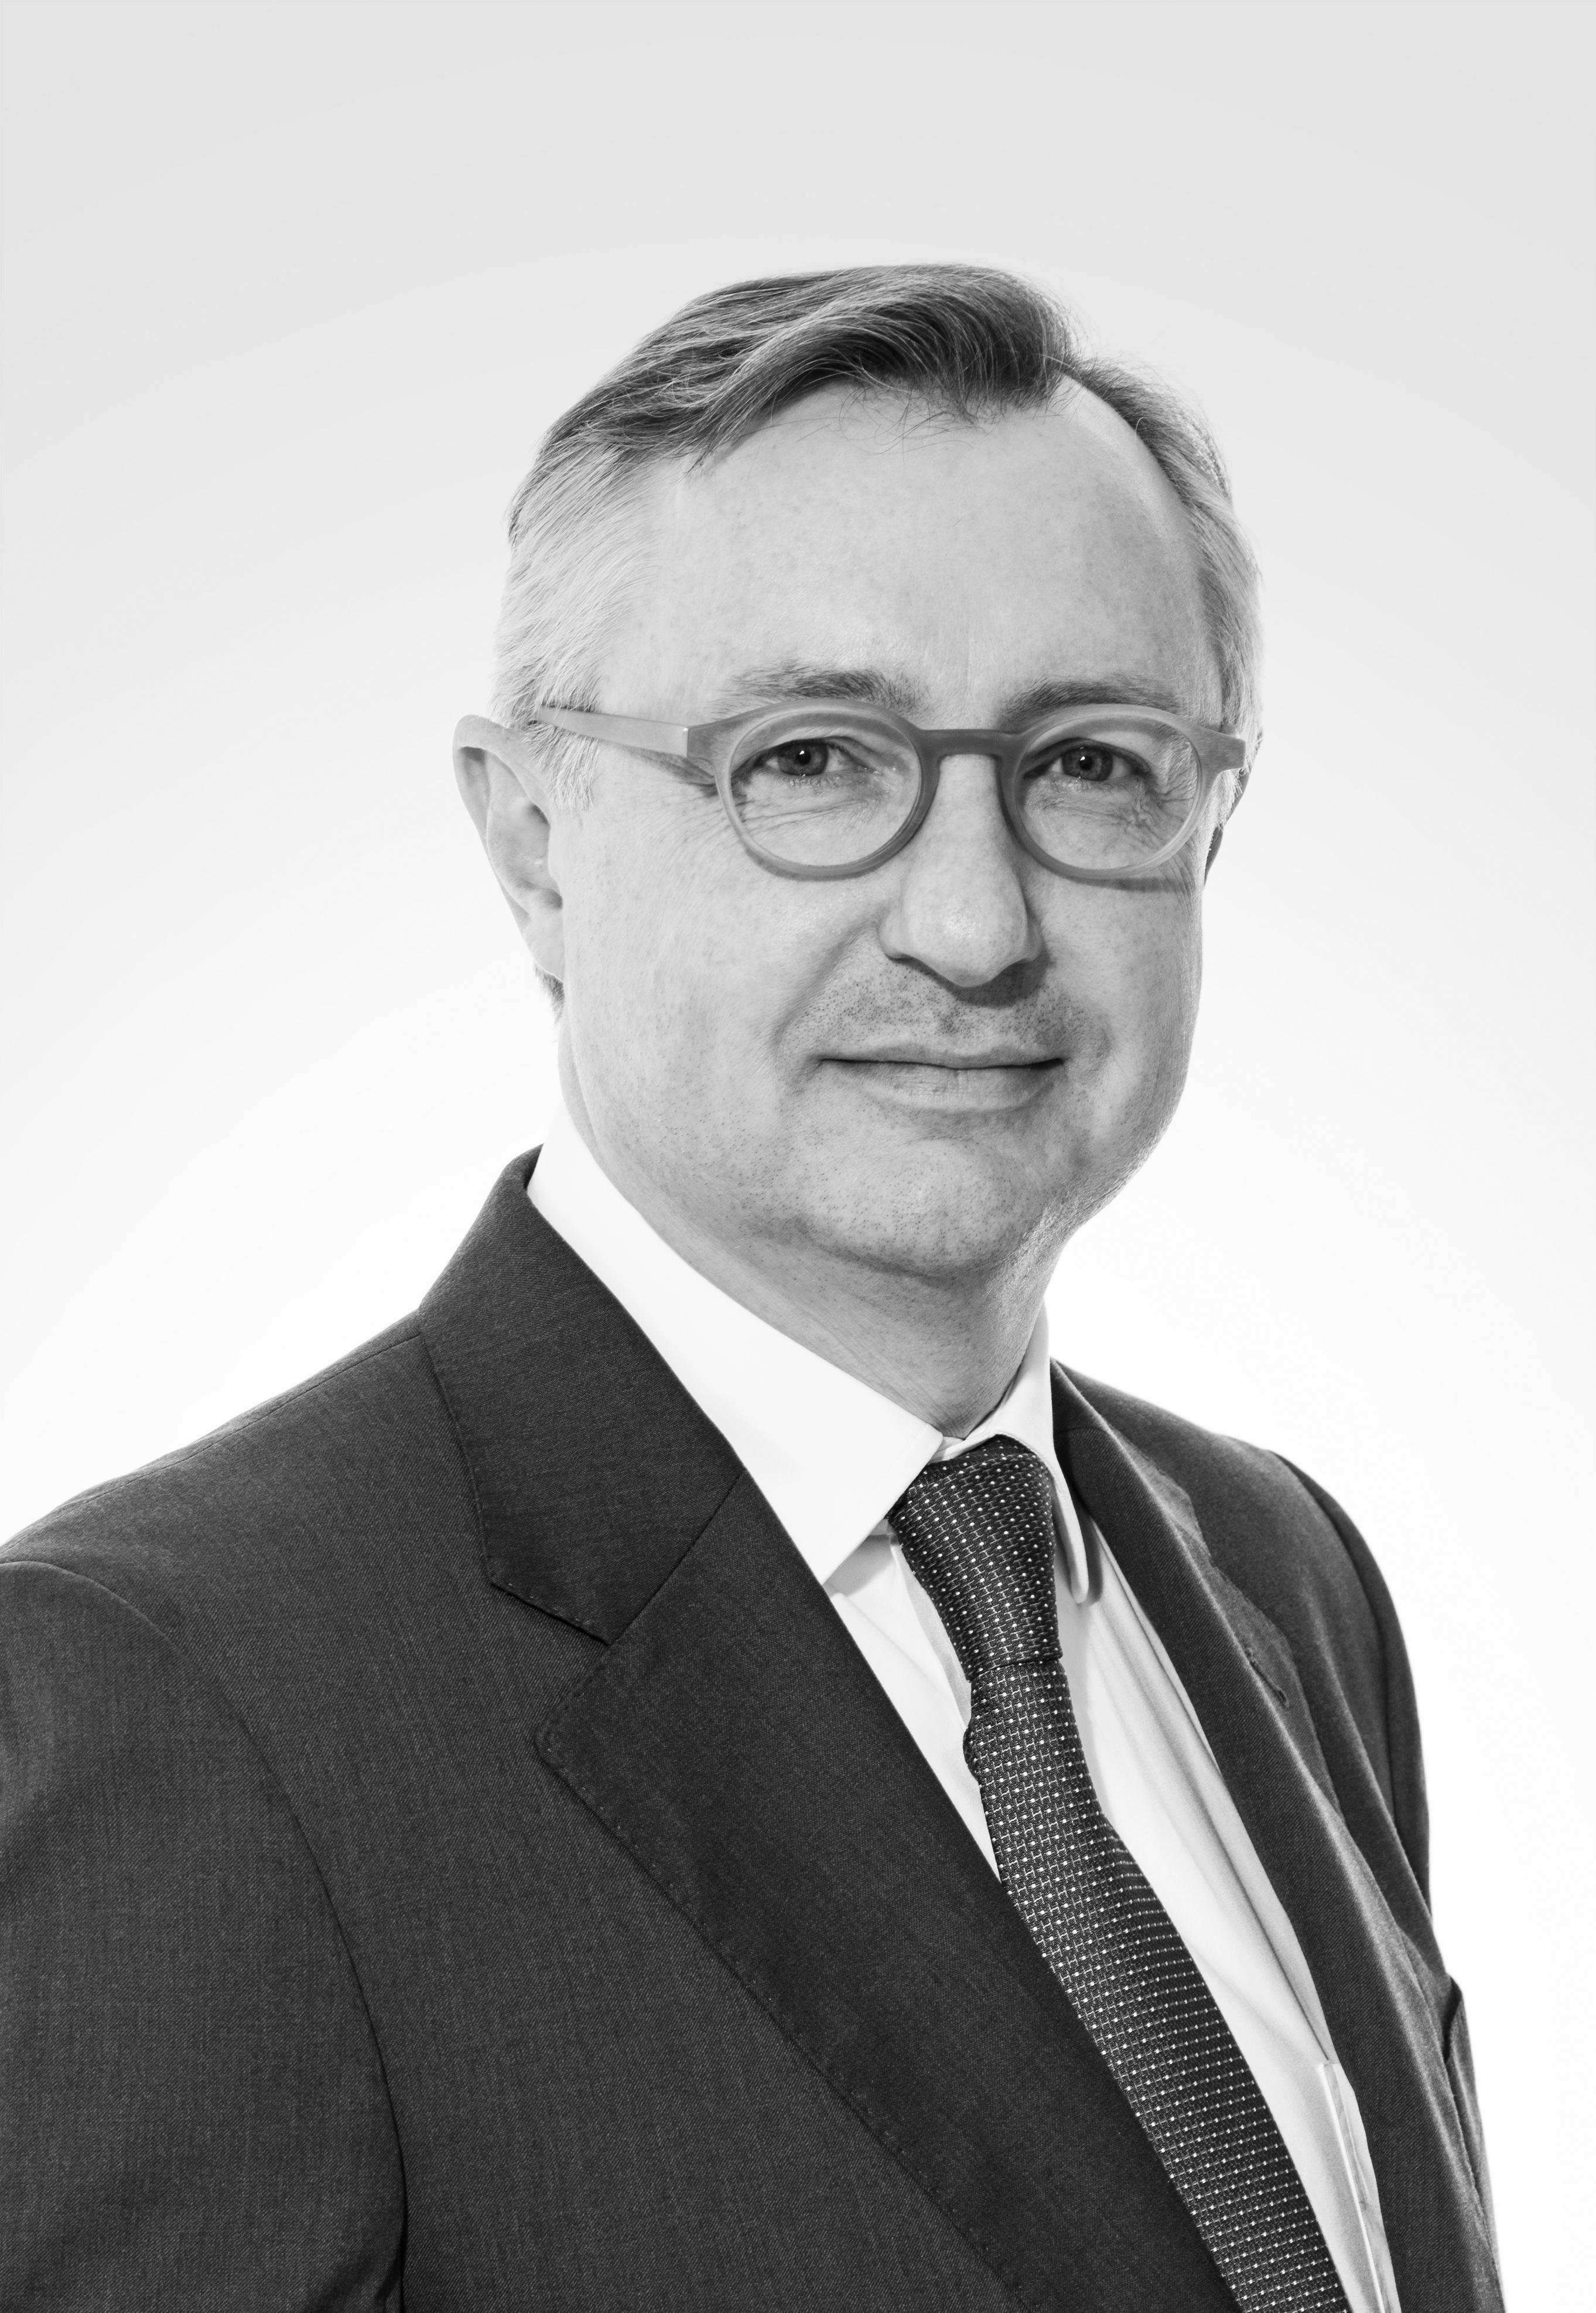 Dr. ThomasZwissler